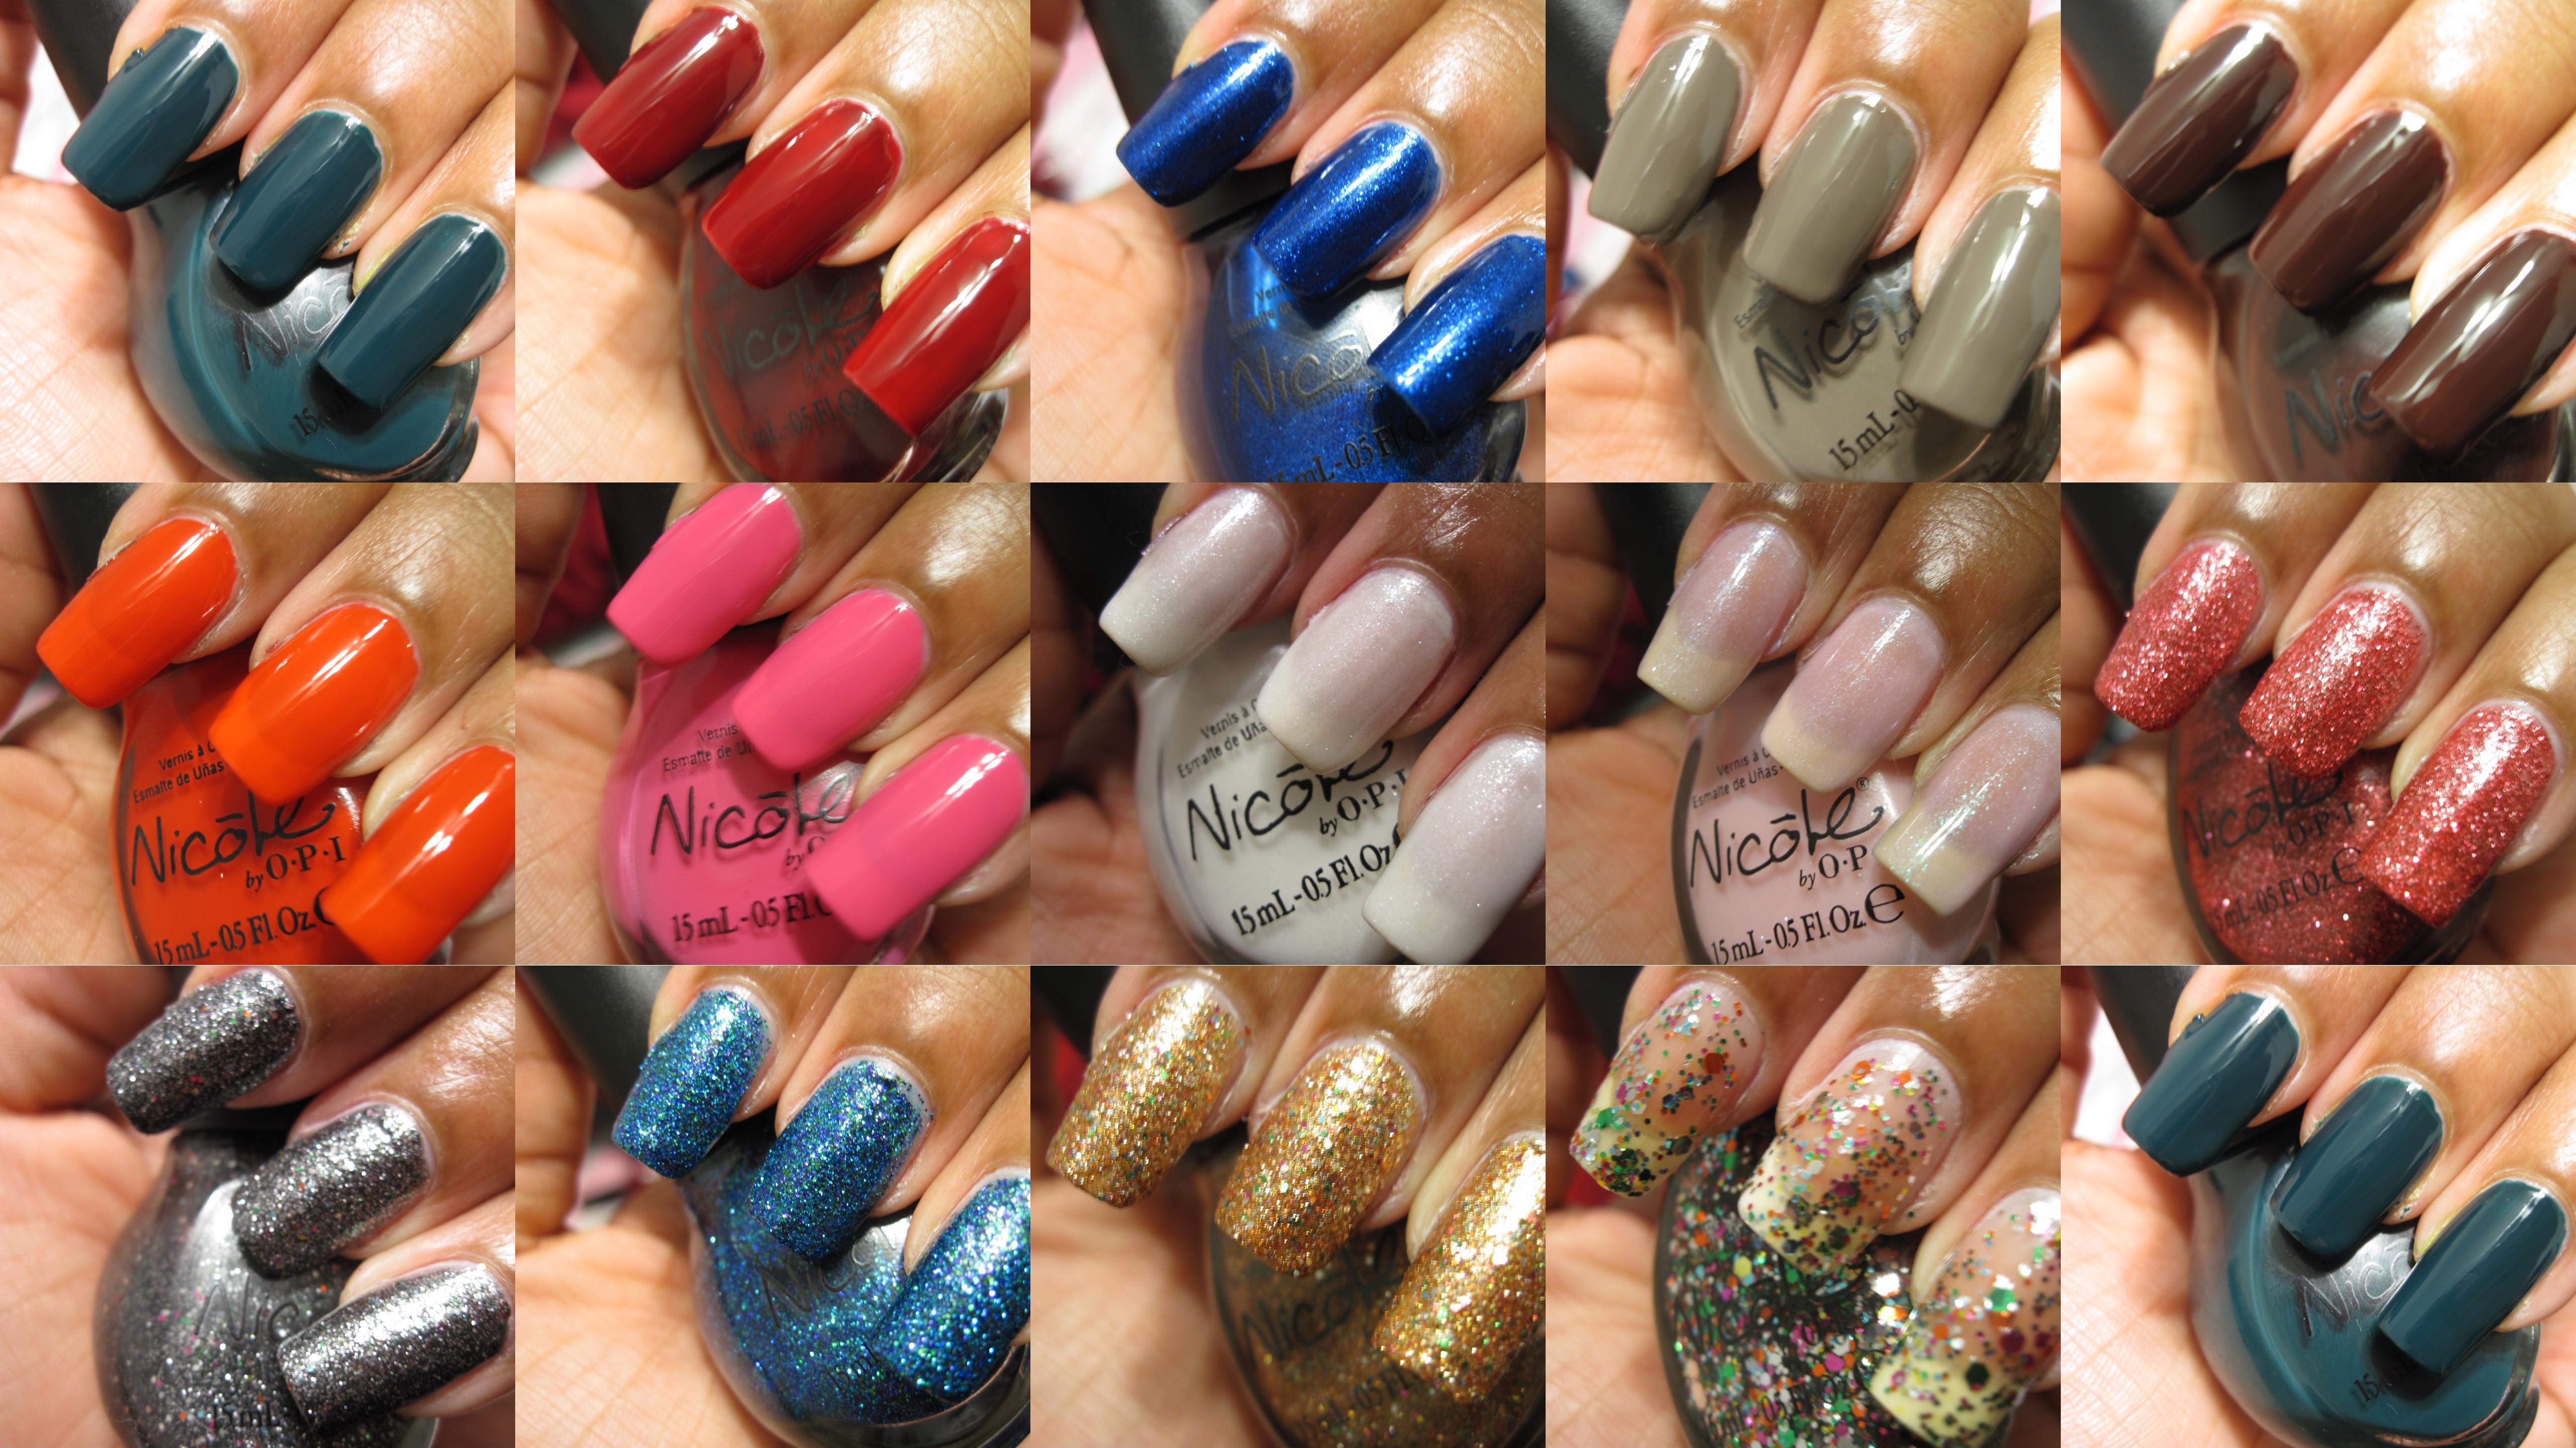 Colorful Kardashian Nail Polish Line Ensign - Nail Art Design Ideas ...